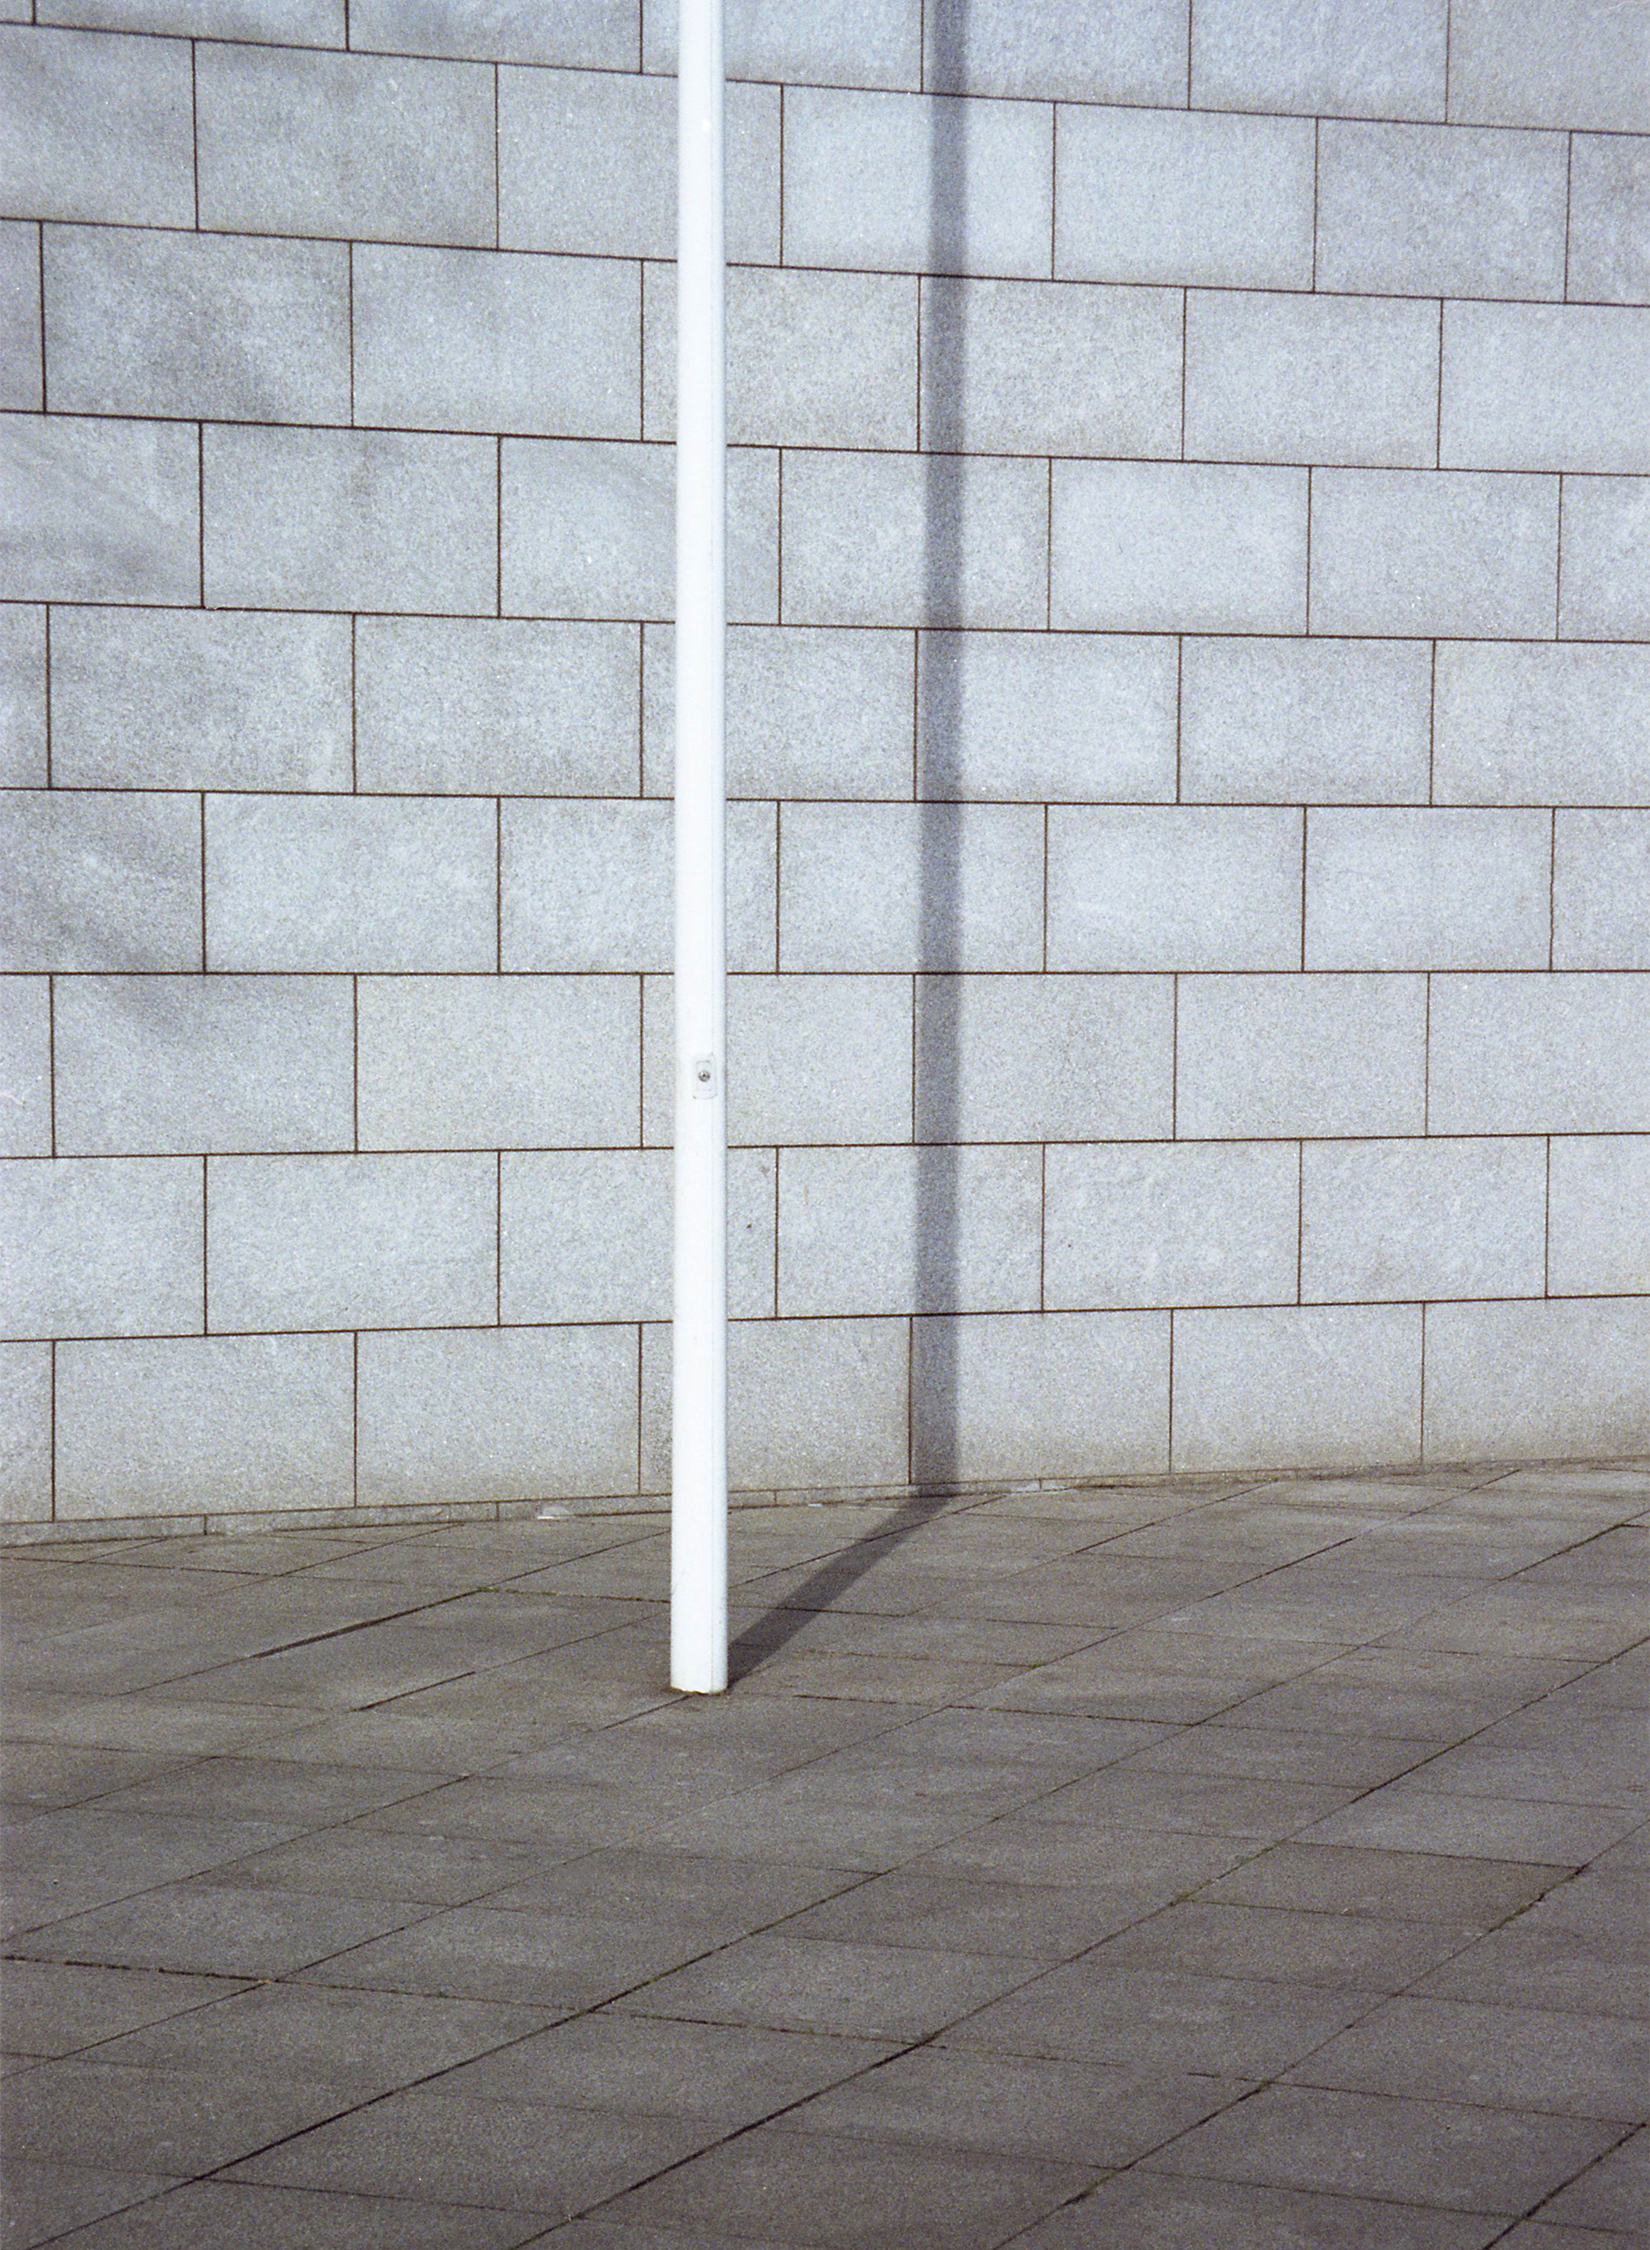 35 white pole copy.jpg